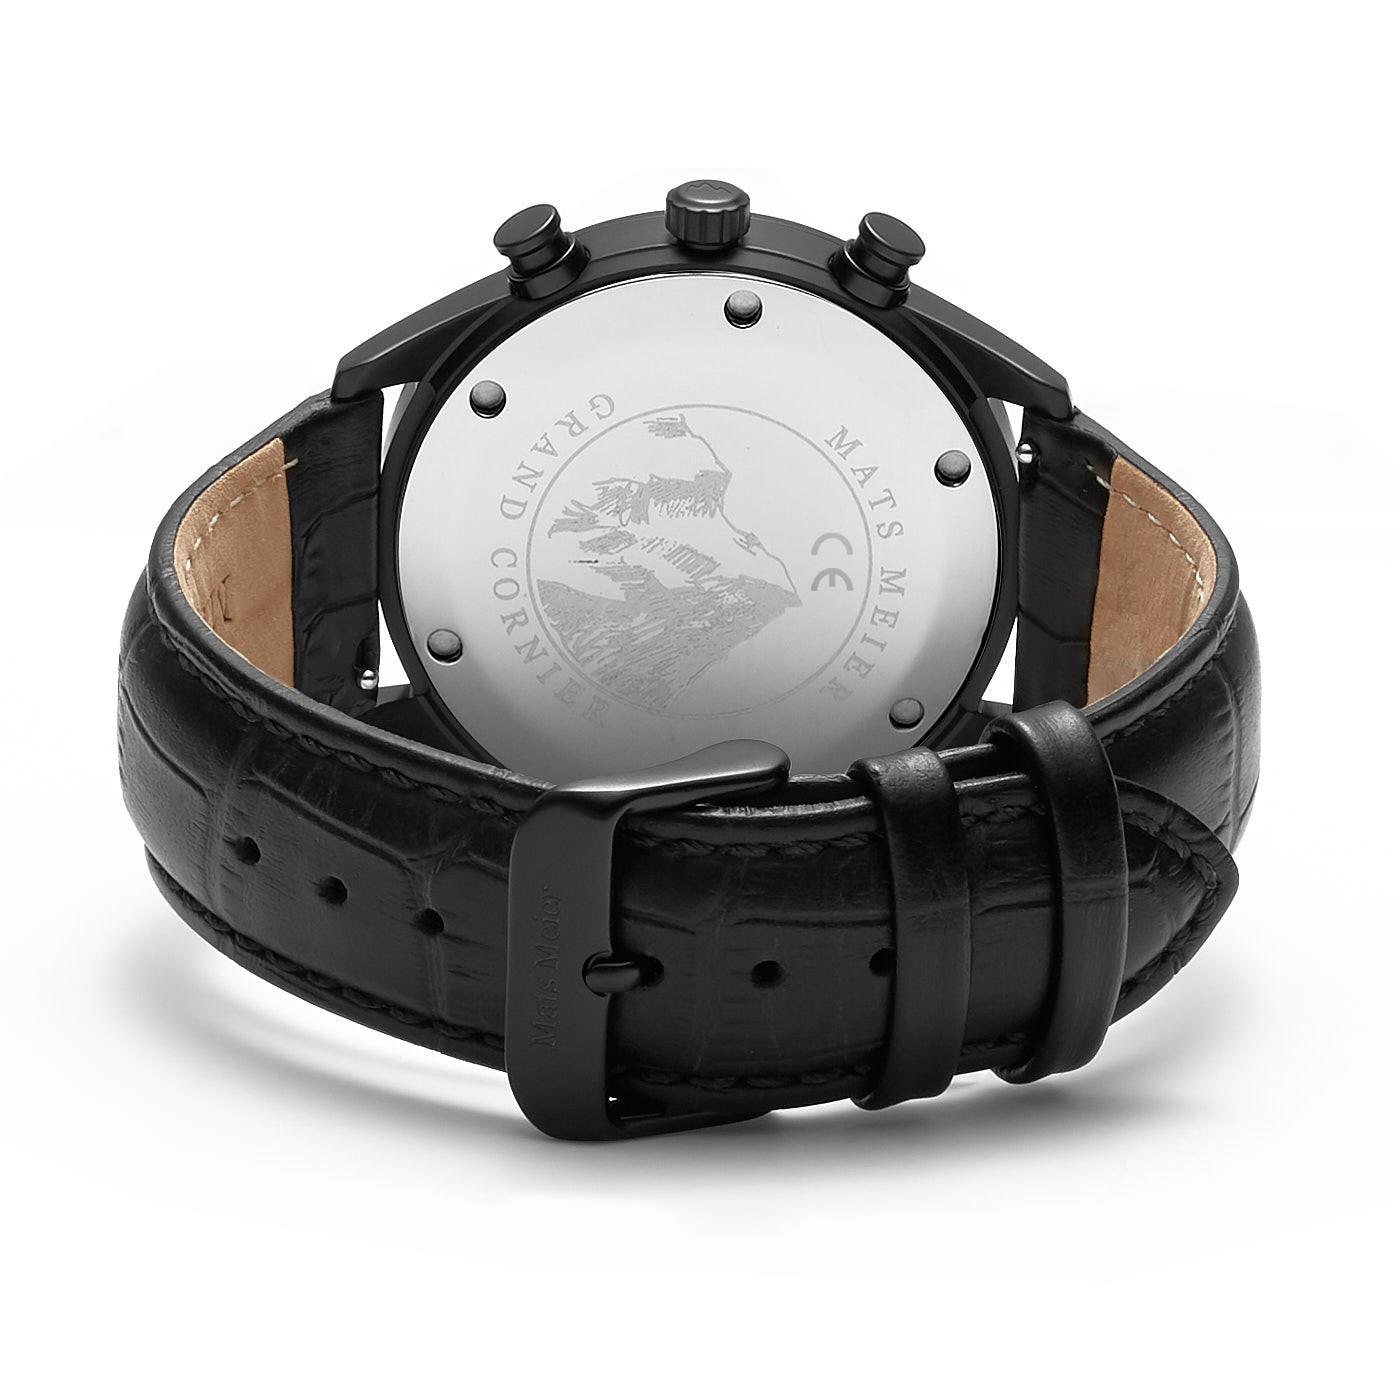 Mats Meier Grand Cornier montre chronographe mat noir